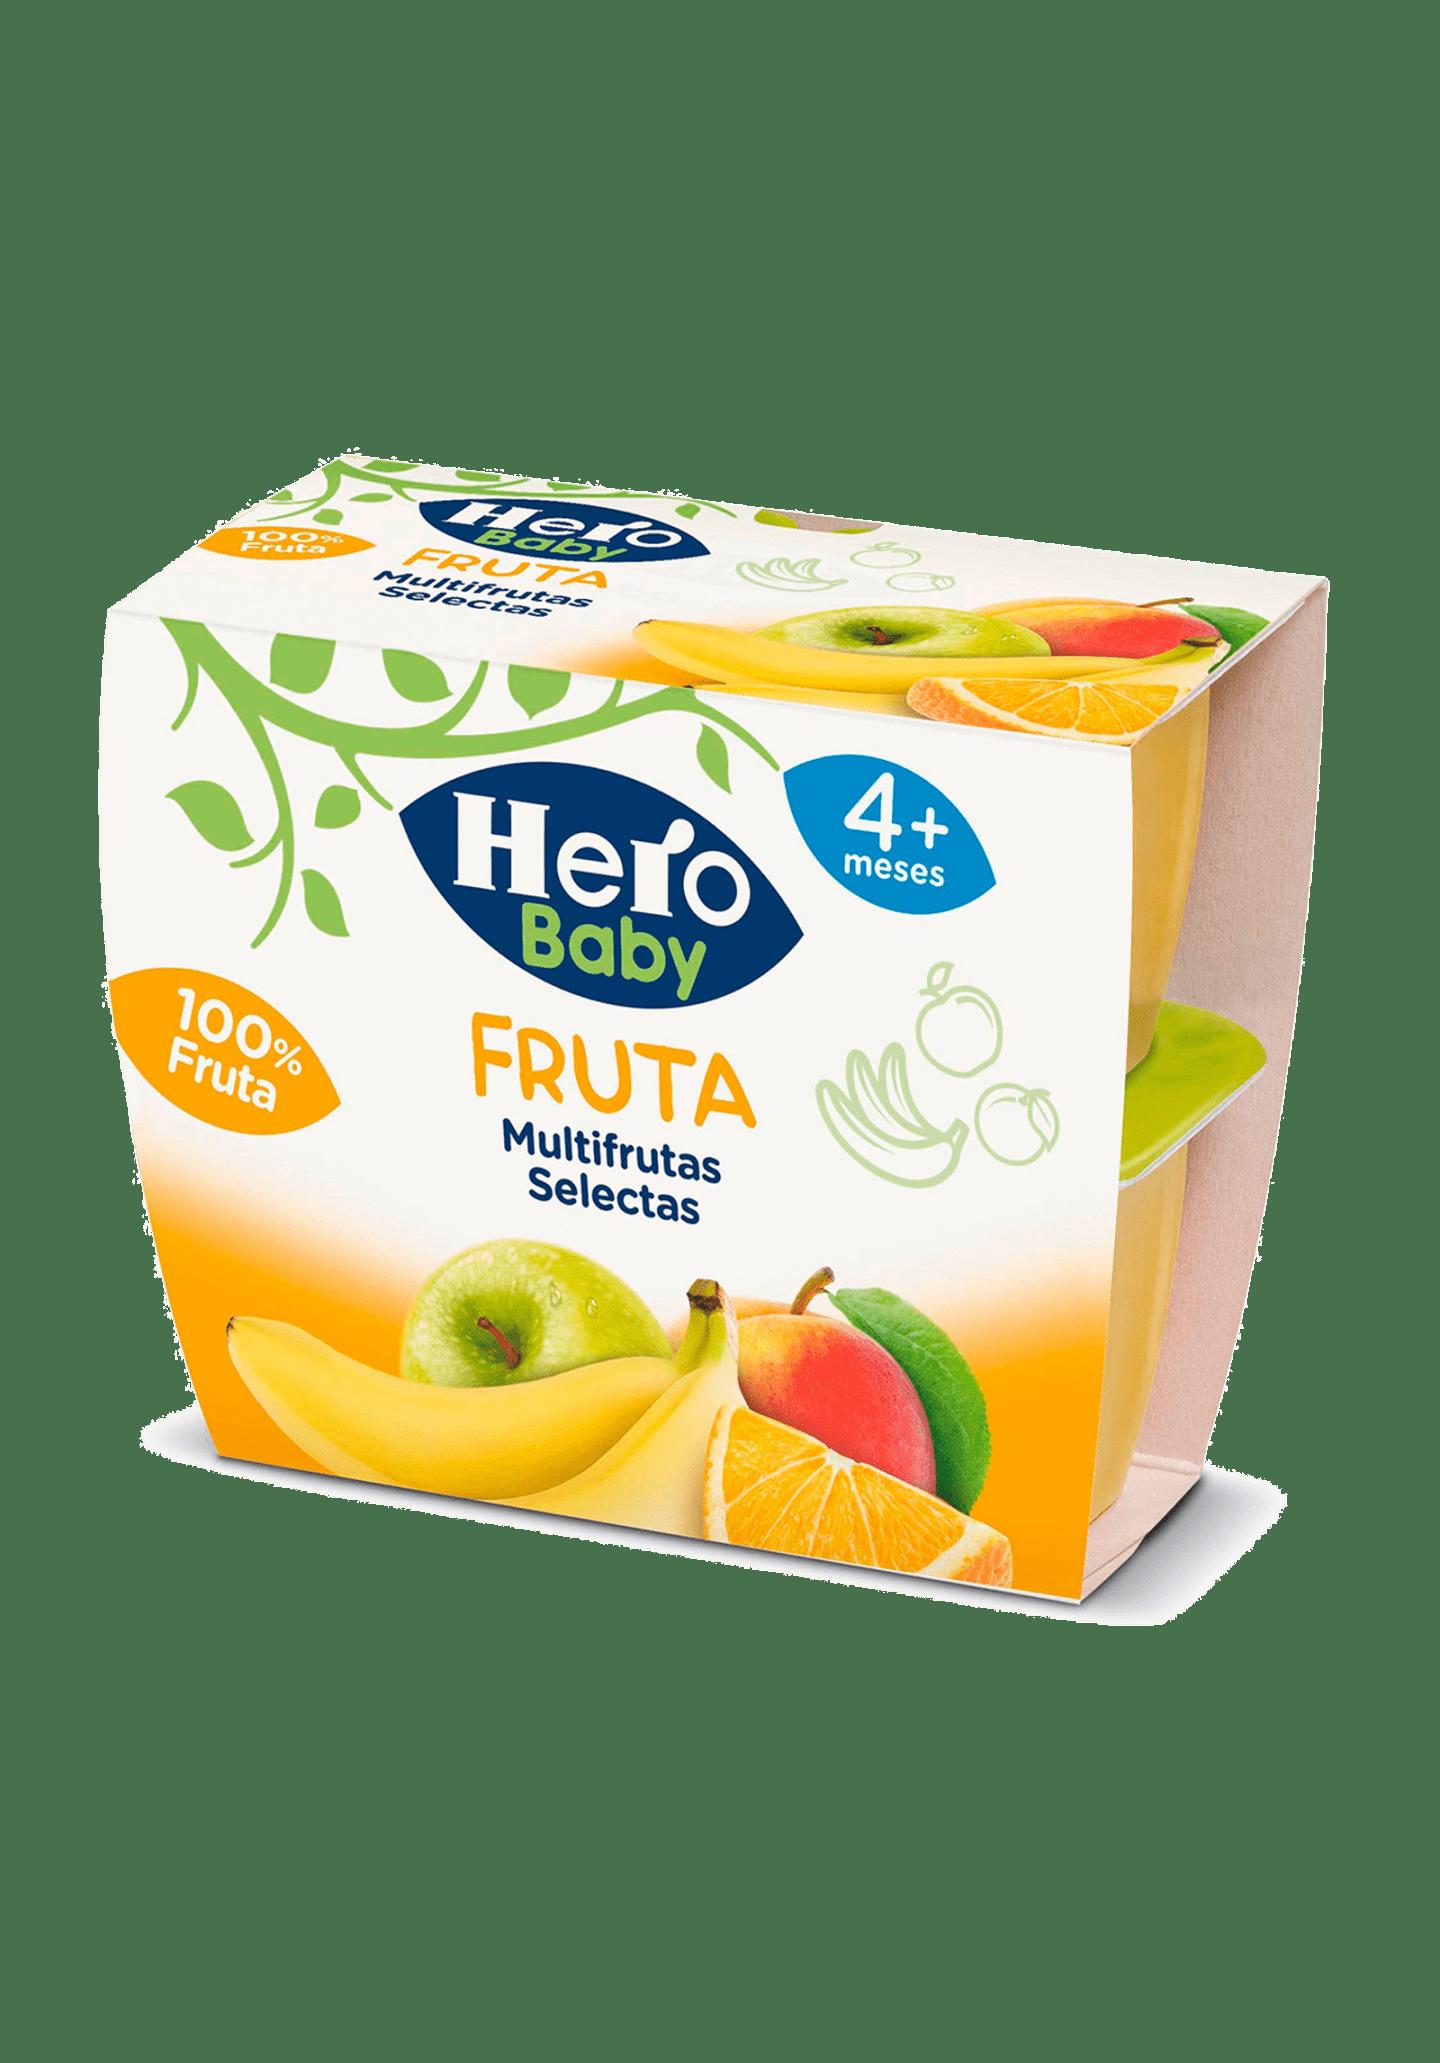 Tarrina de Multifrutas Selectas